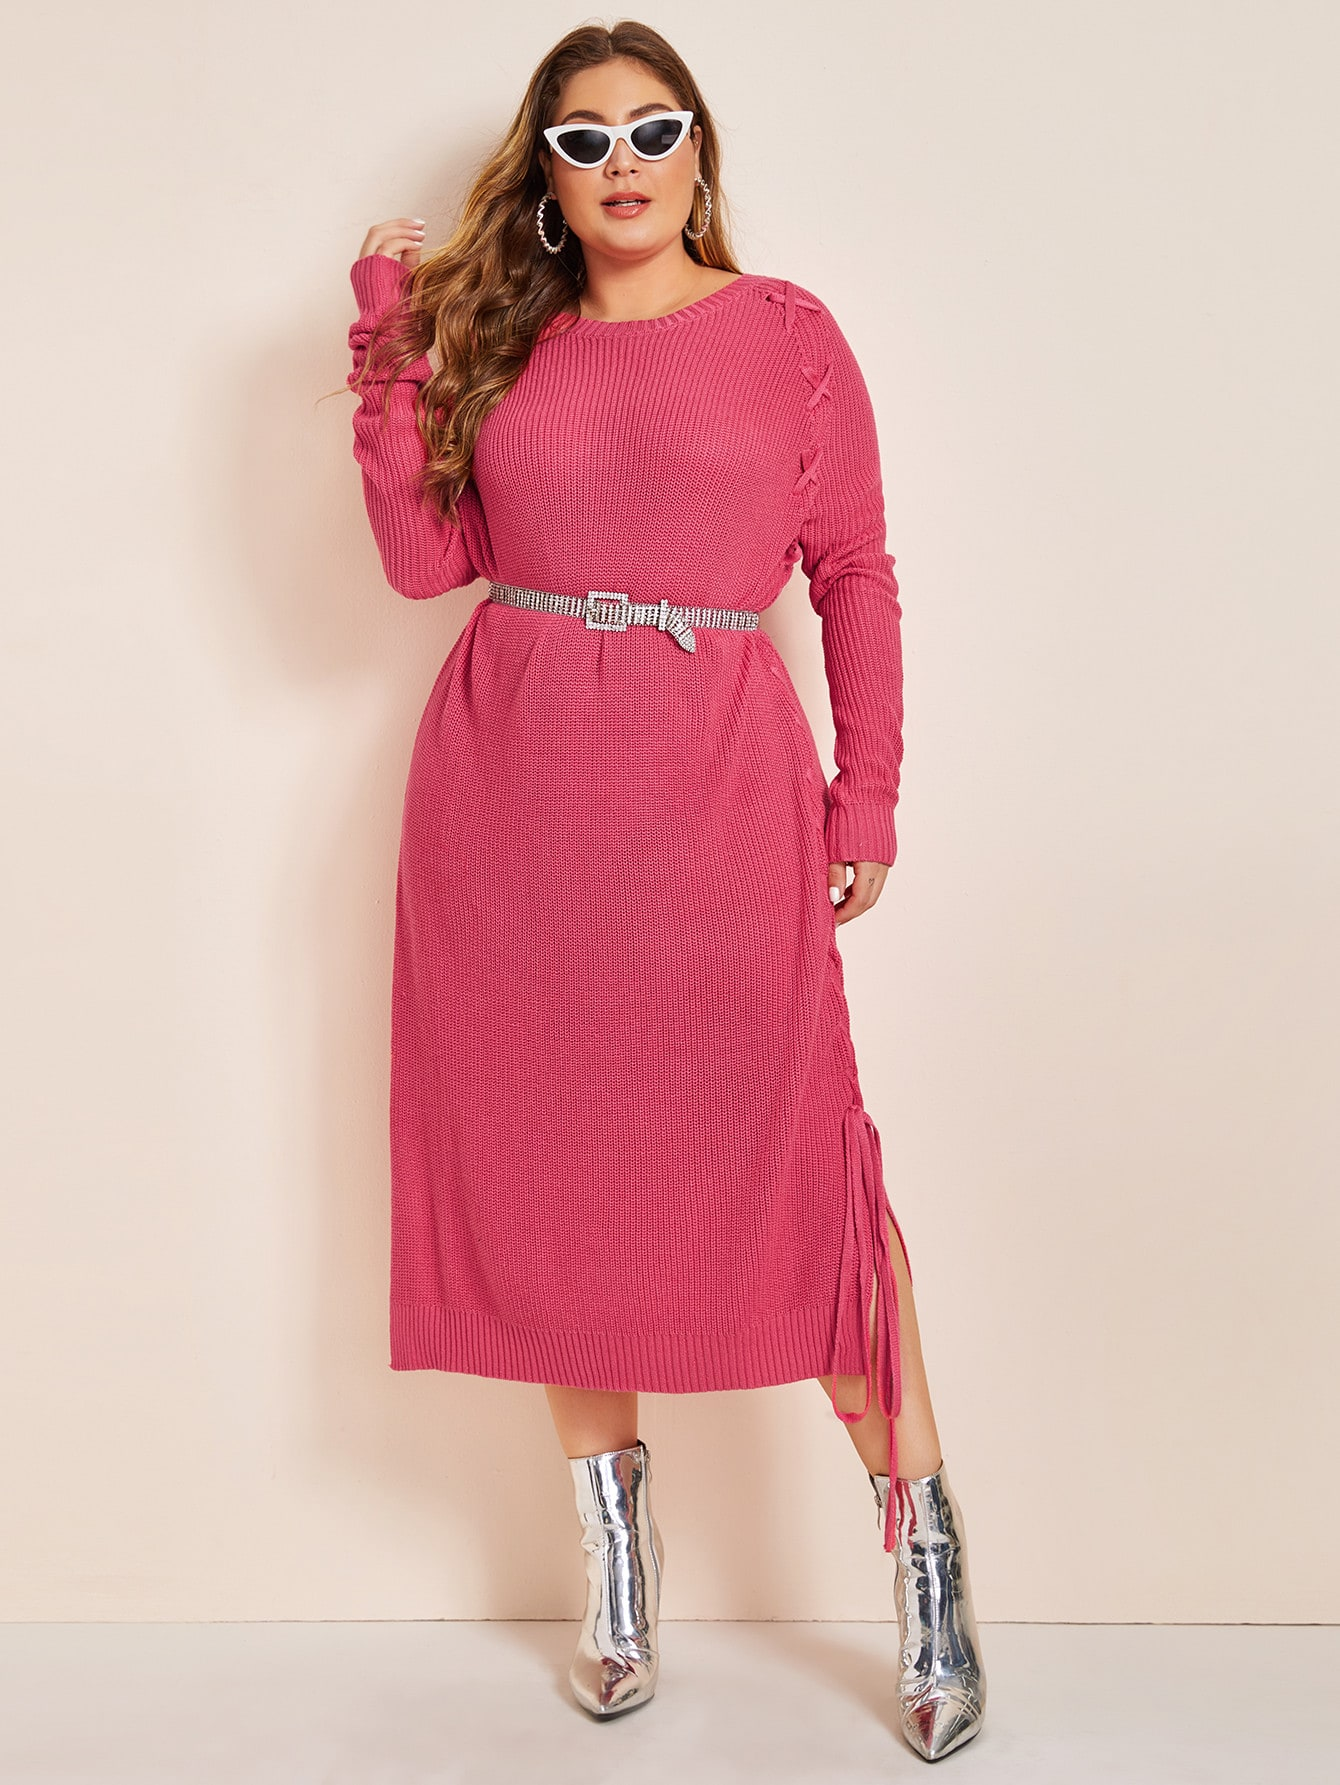 Plus Neon Pink Lace Up Slit Hem Sweater Dress Without Belt Carol